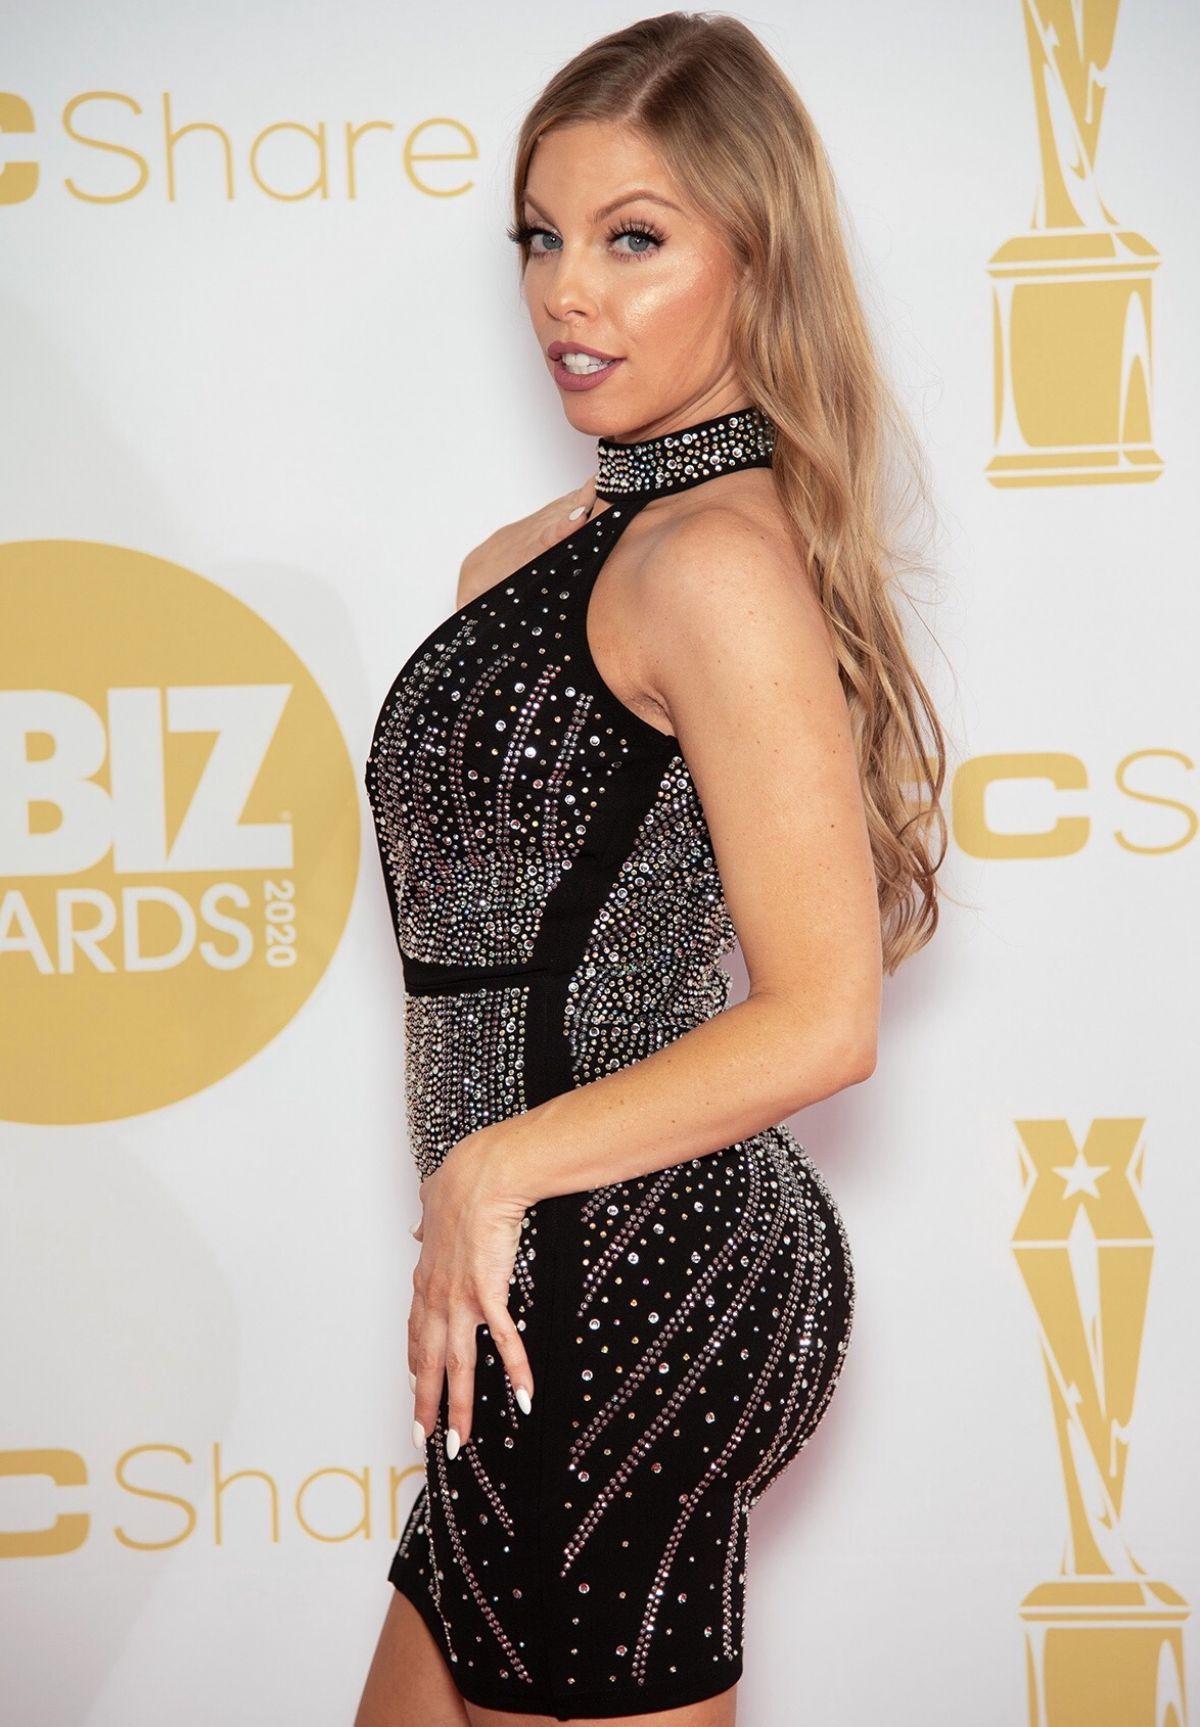 BRITNEY AMBER at 2020 Xbiz Awards in Los Angeles 01/16